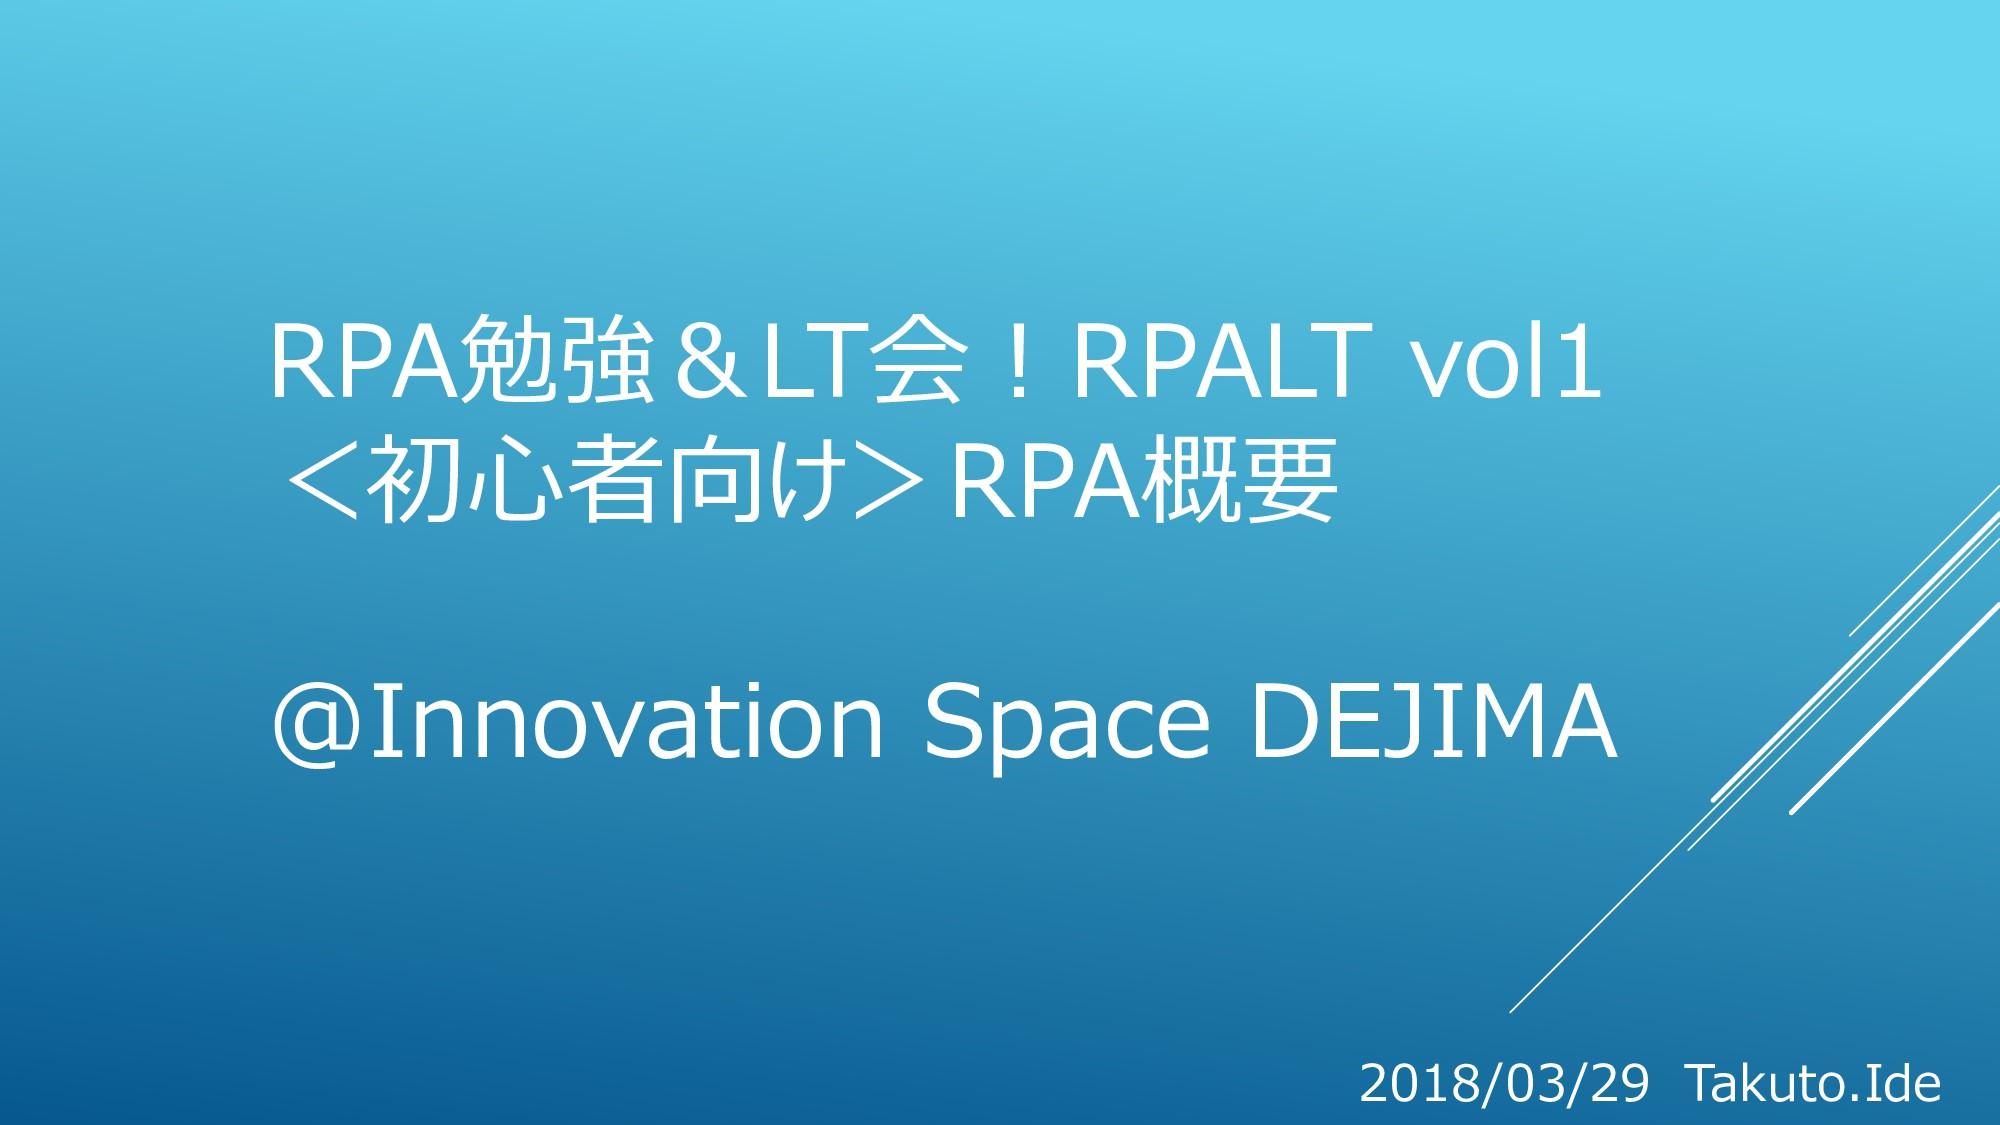 RPA勉強&LT会!RPALT vol1 <初心者向け>RPA概要 @Innovation S...